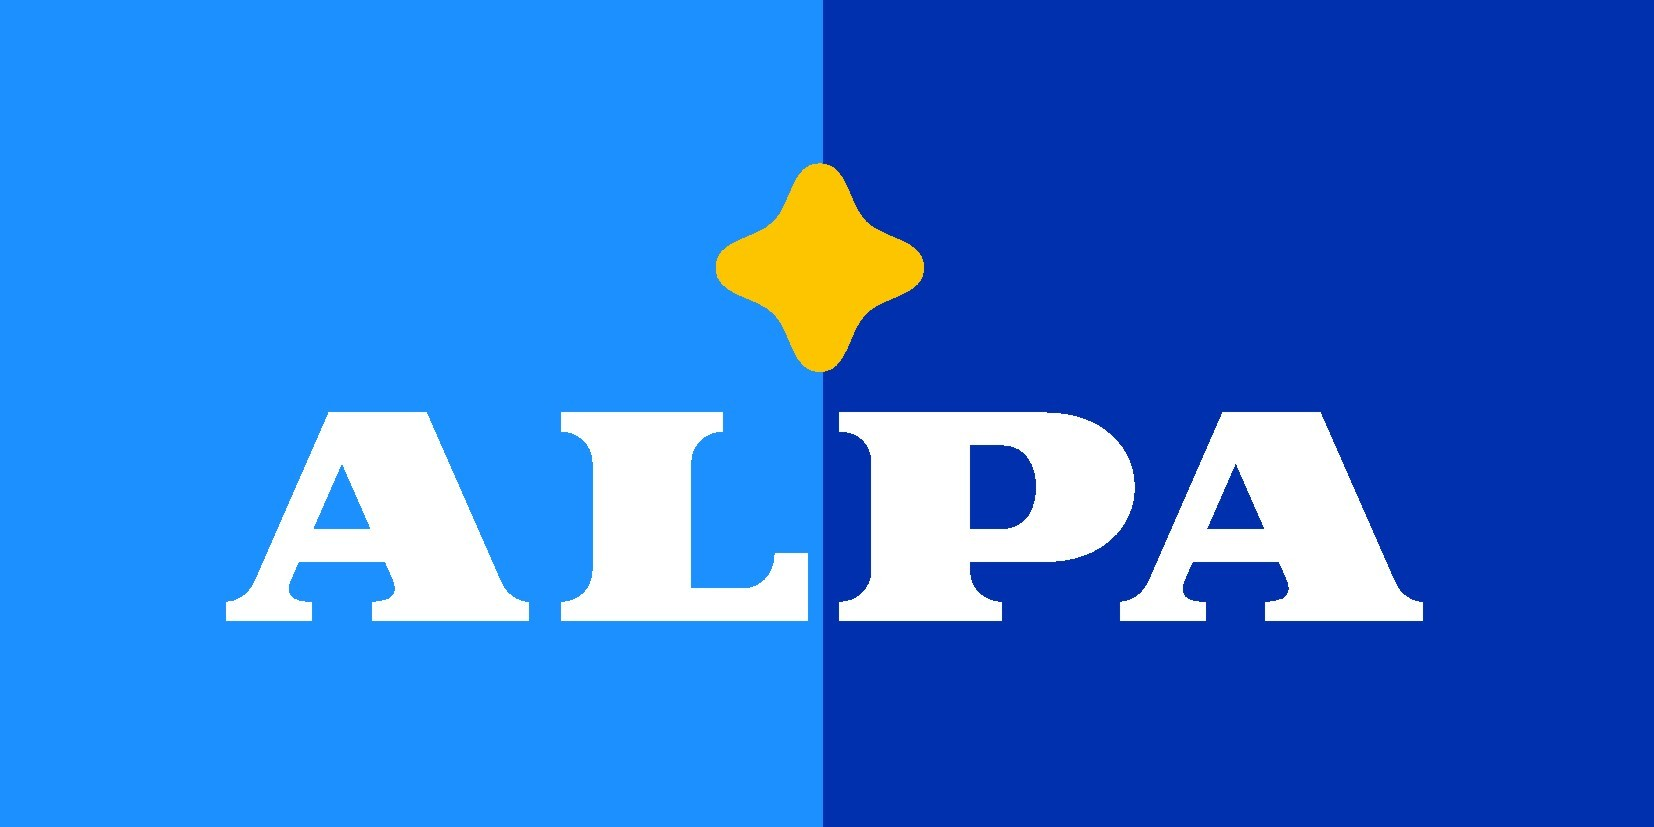 ALPA - натуральная чешская продукция